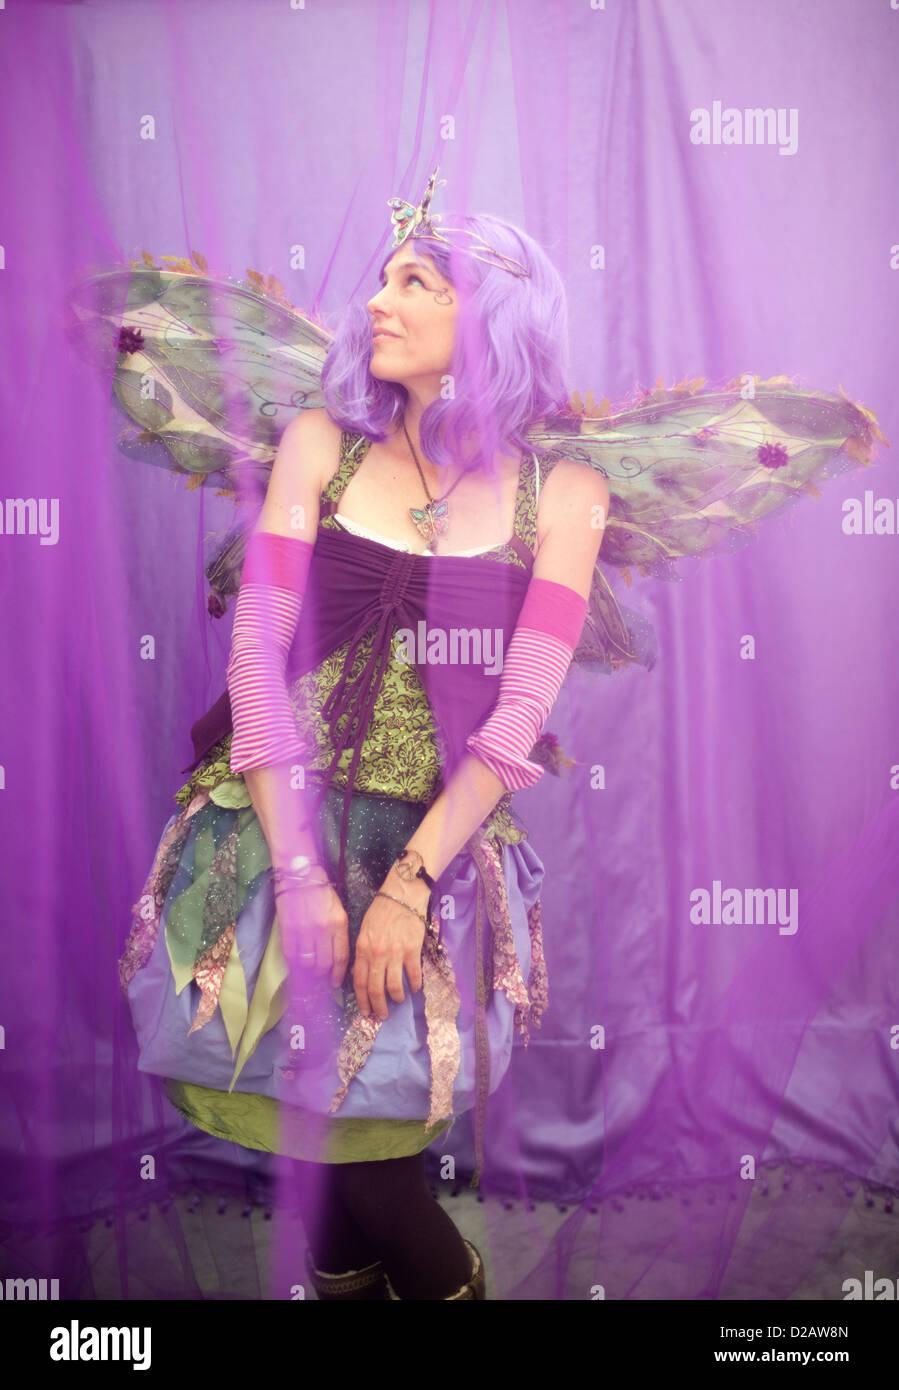 Weibliche Fee in ihrem lila Traum. Stockbild